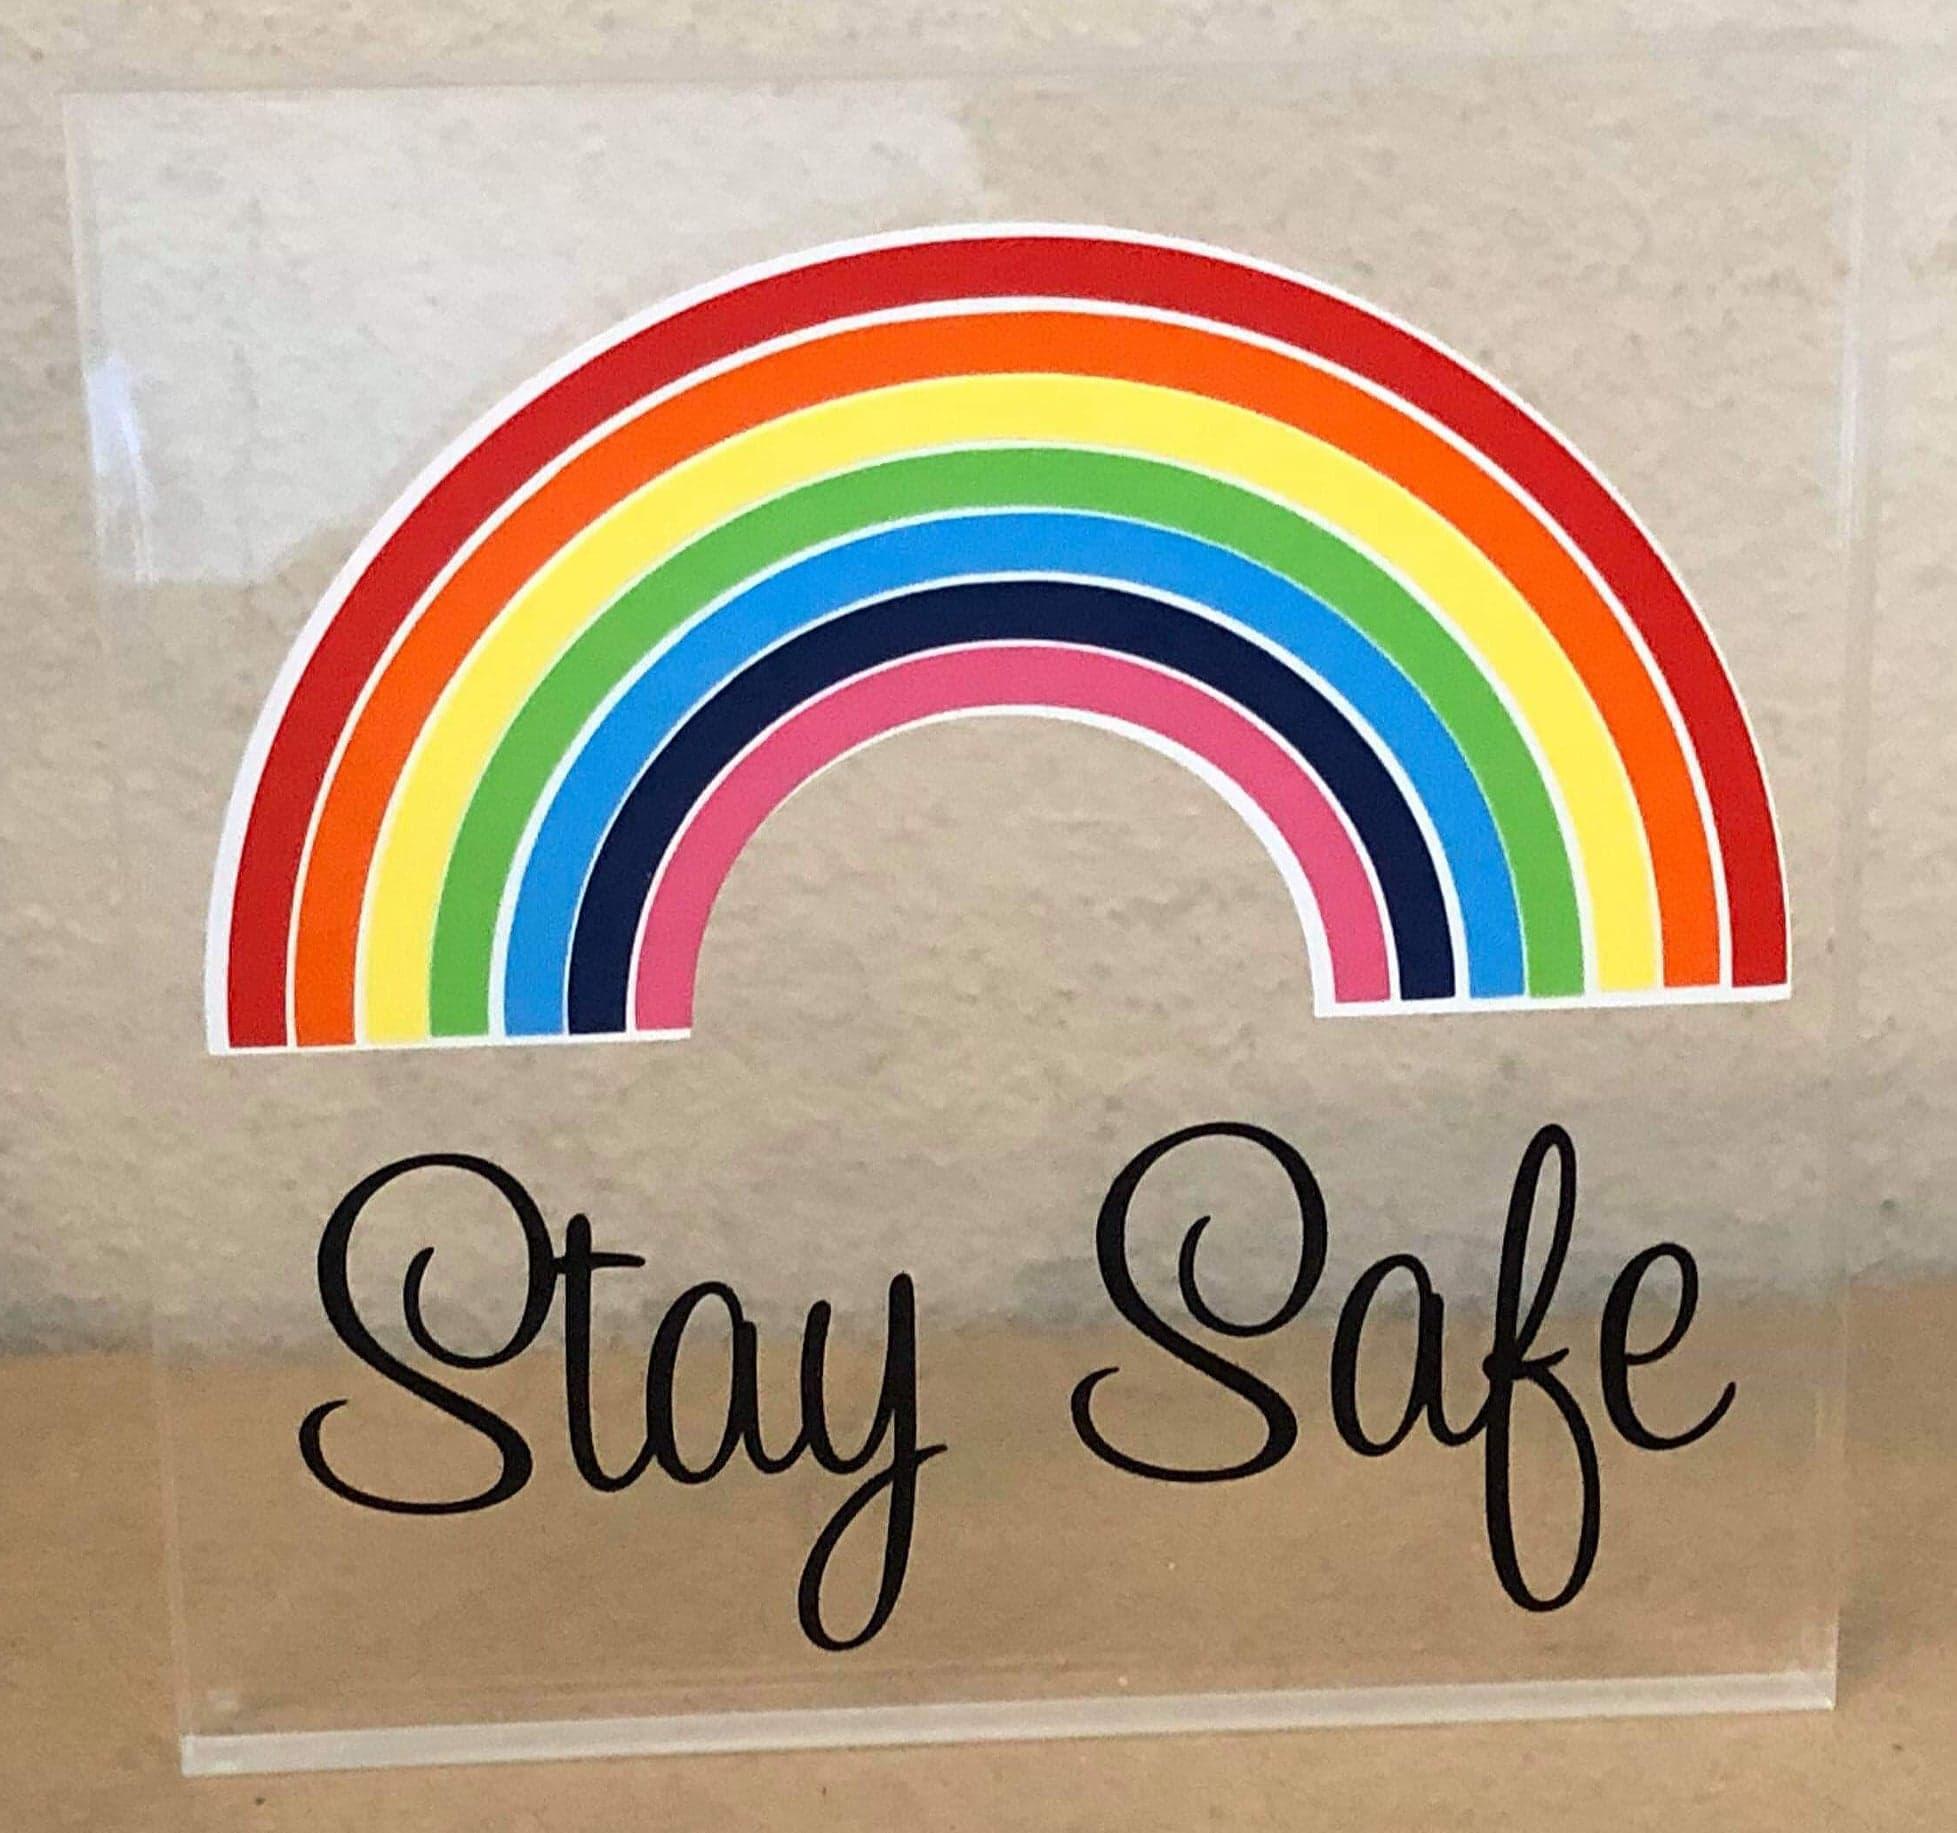 10mm Clear Acrylic Block With Stay Safe Rainbow Vinyl